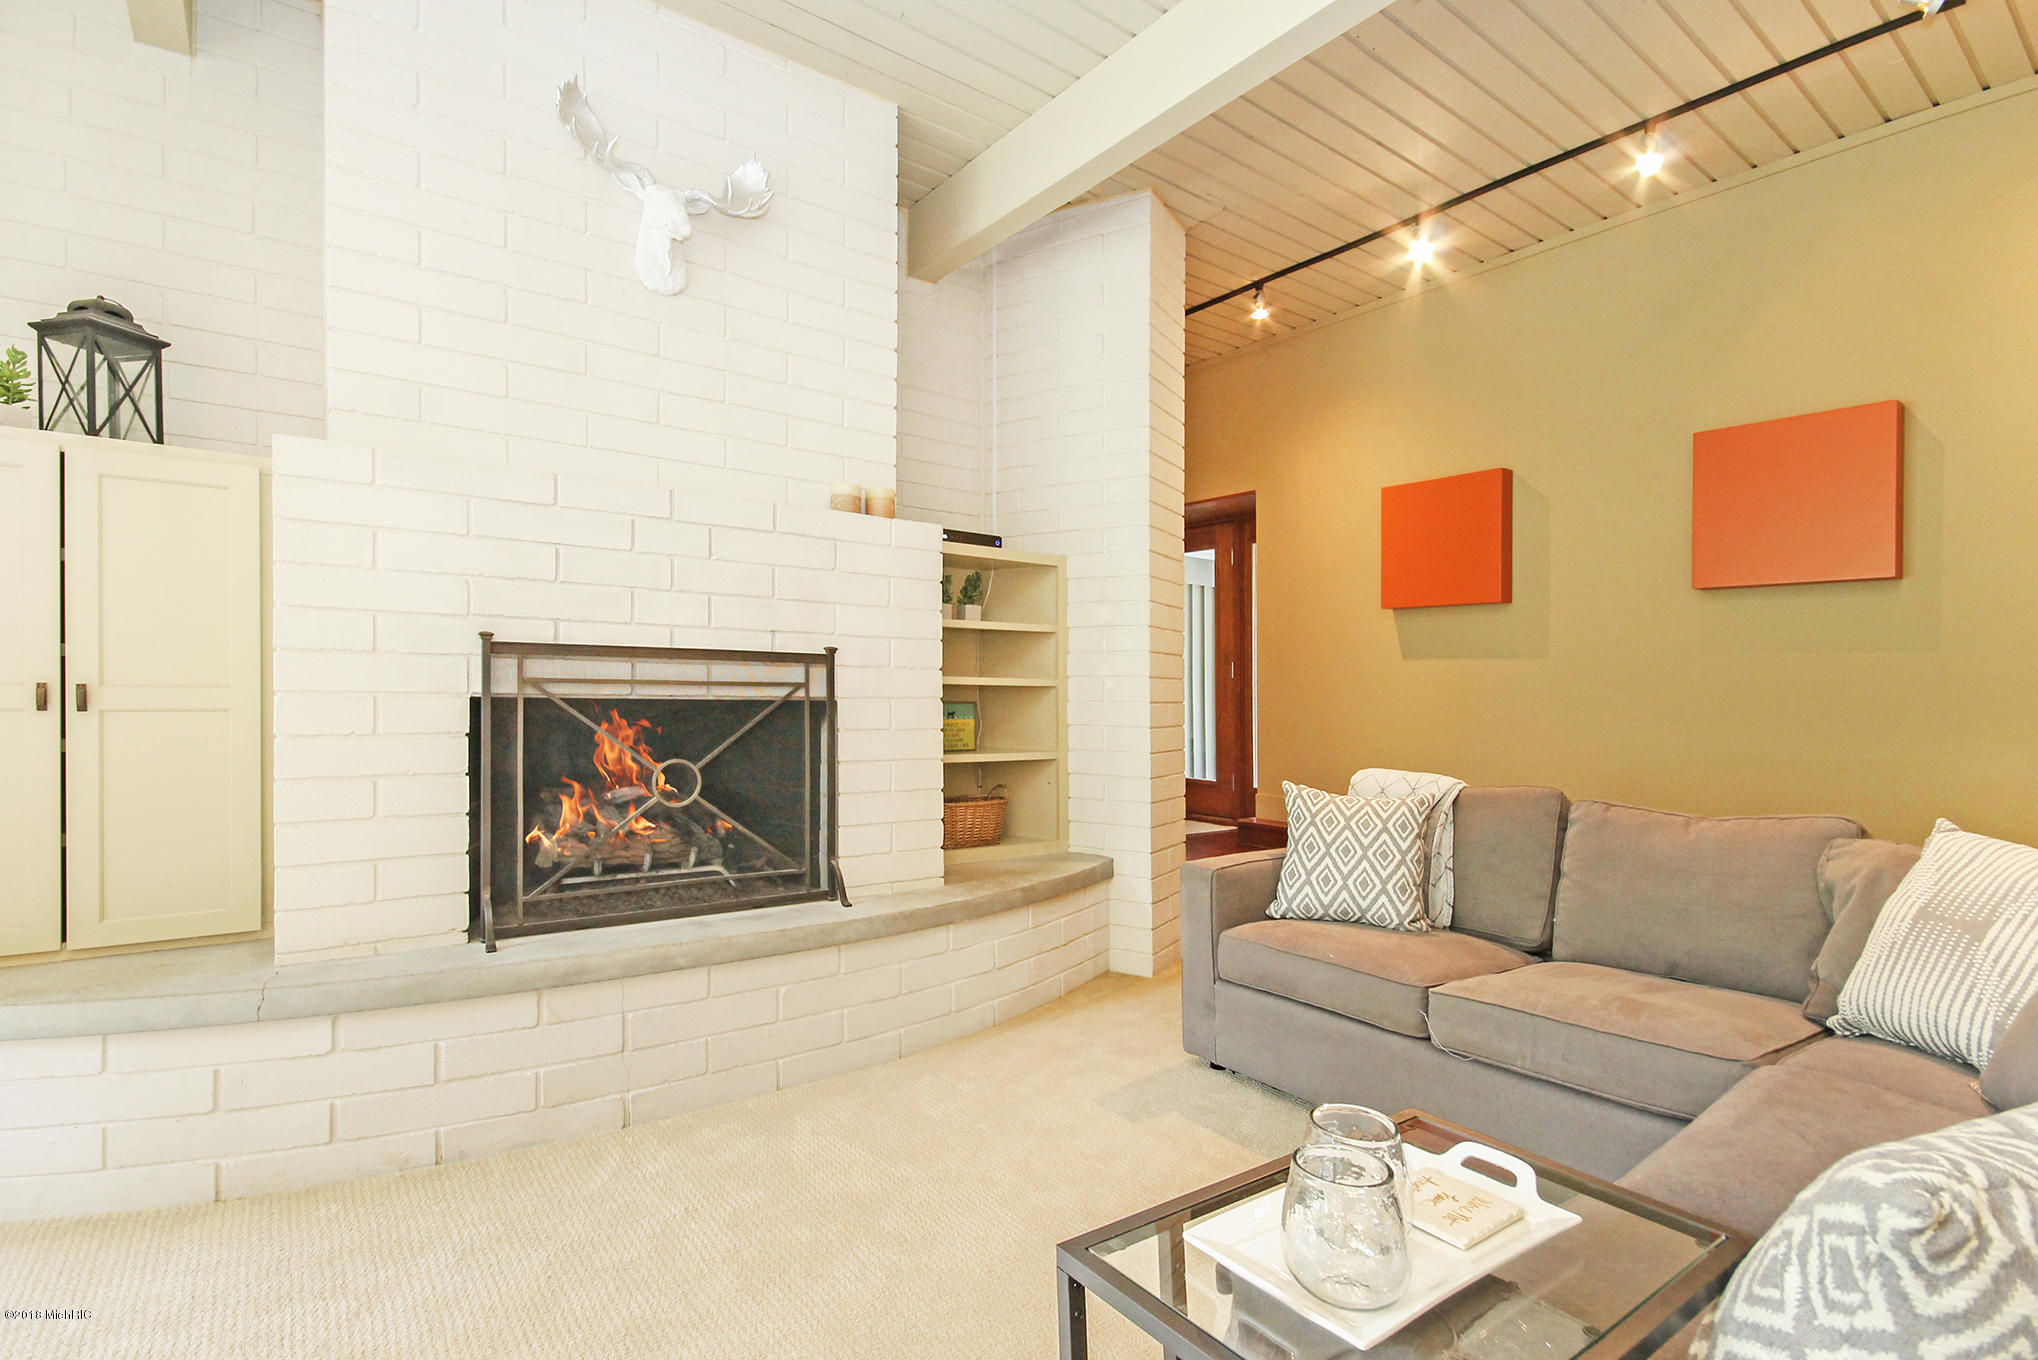 30new-fireplace.jpg